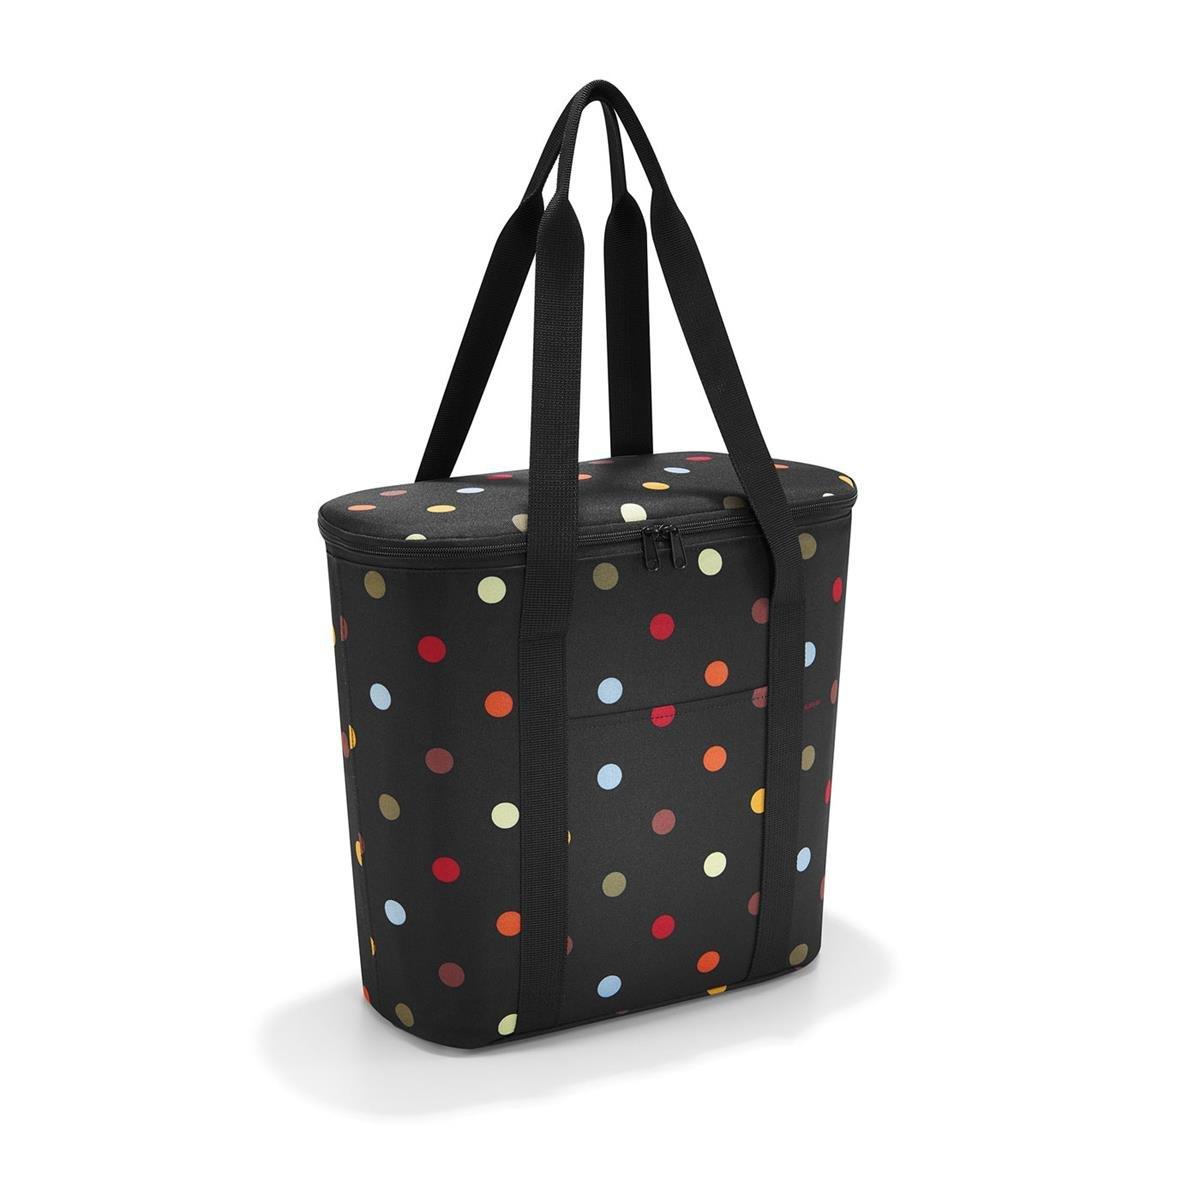 Reisenthel thermoshopper Bagage Cabine 38 Centimeters 15 Multicolore Dots